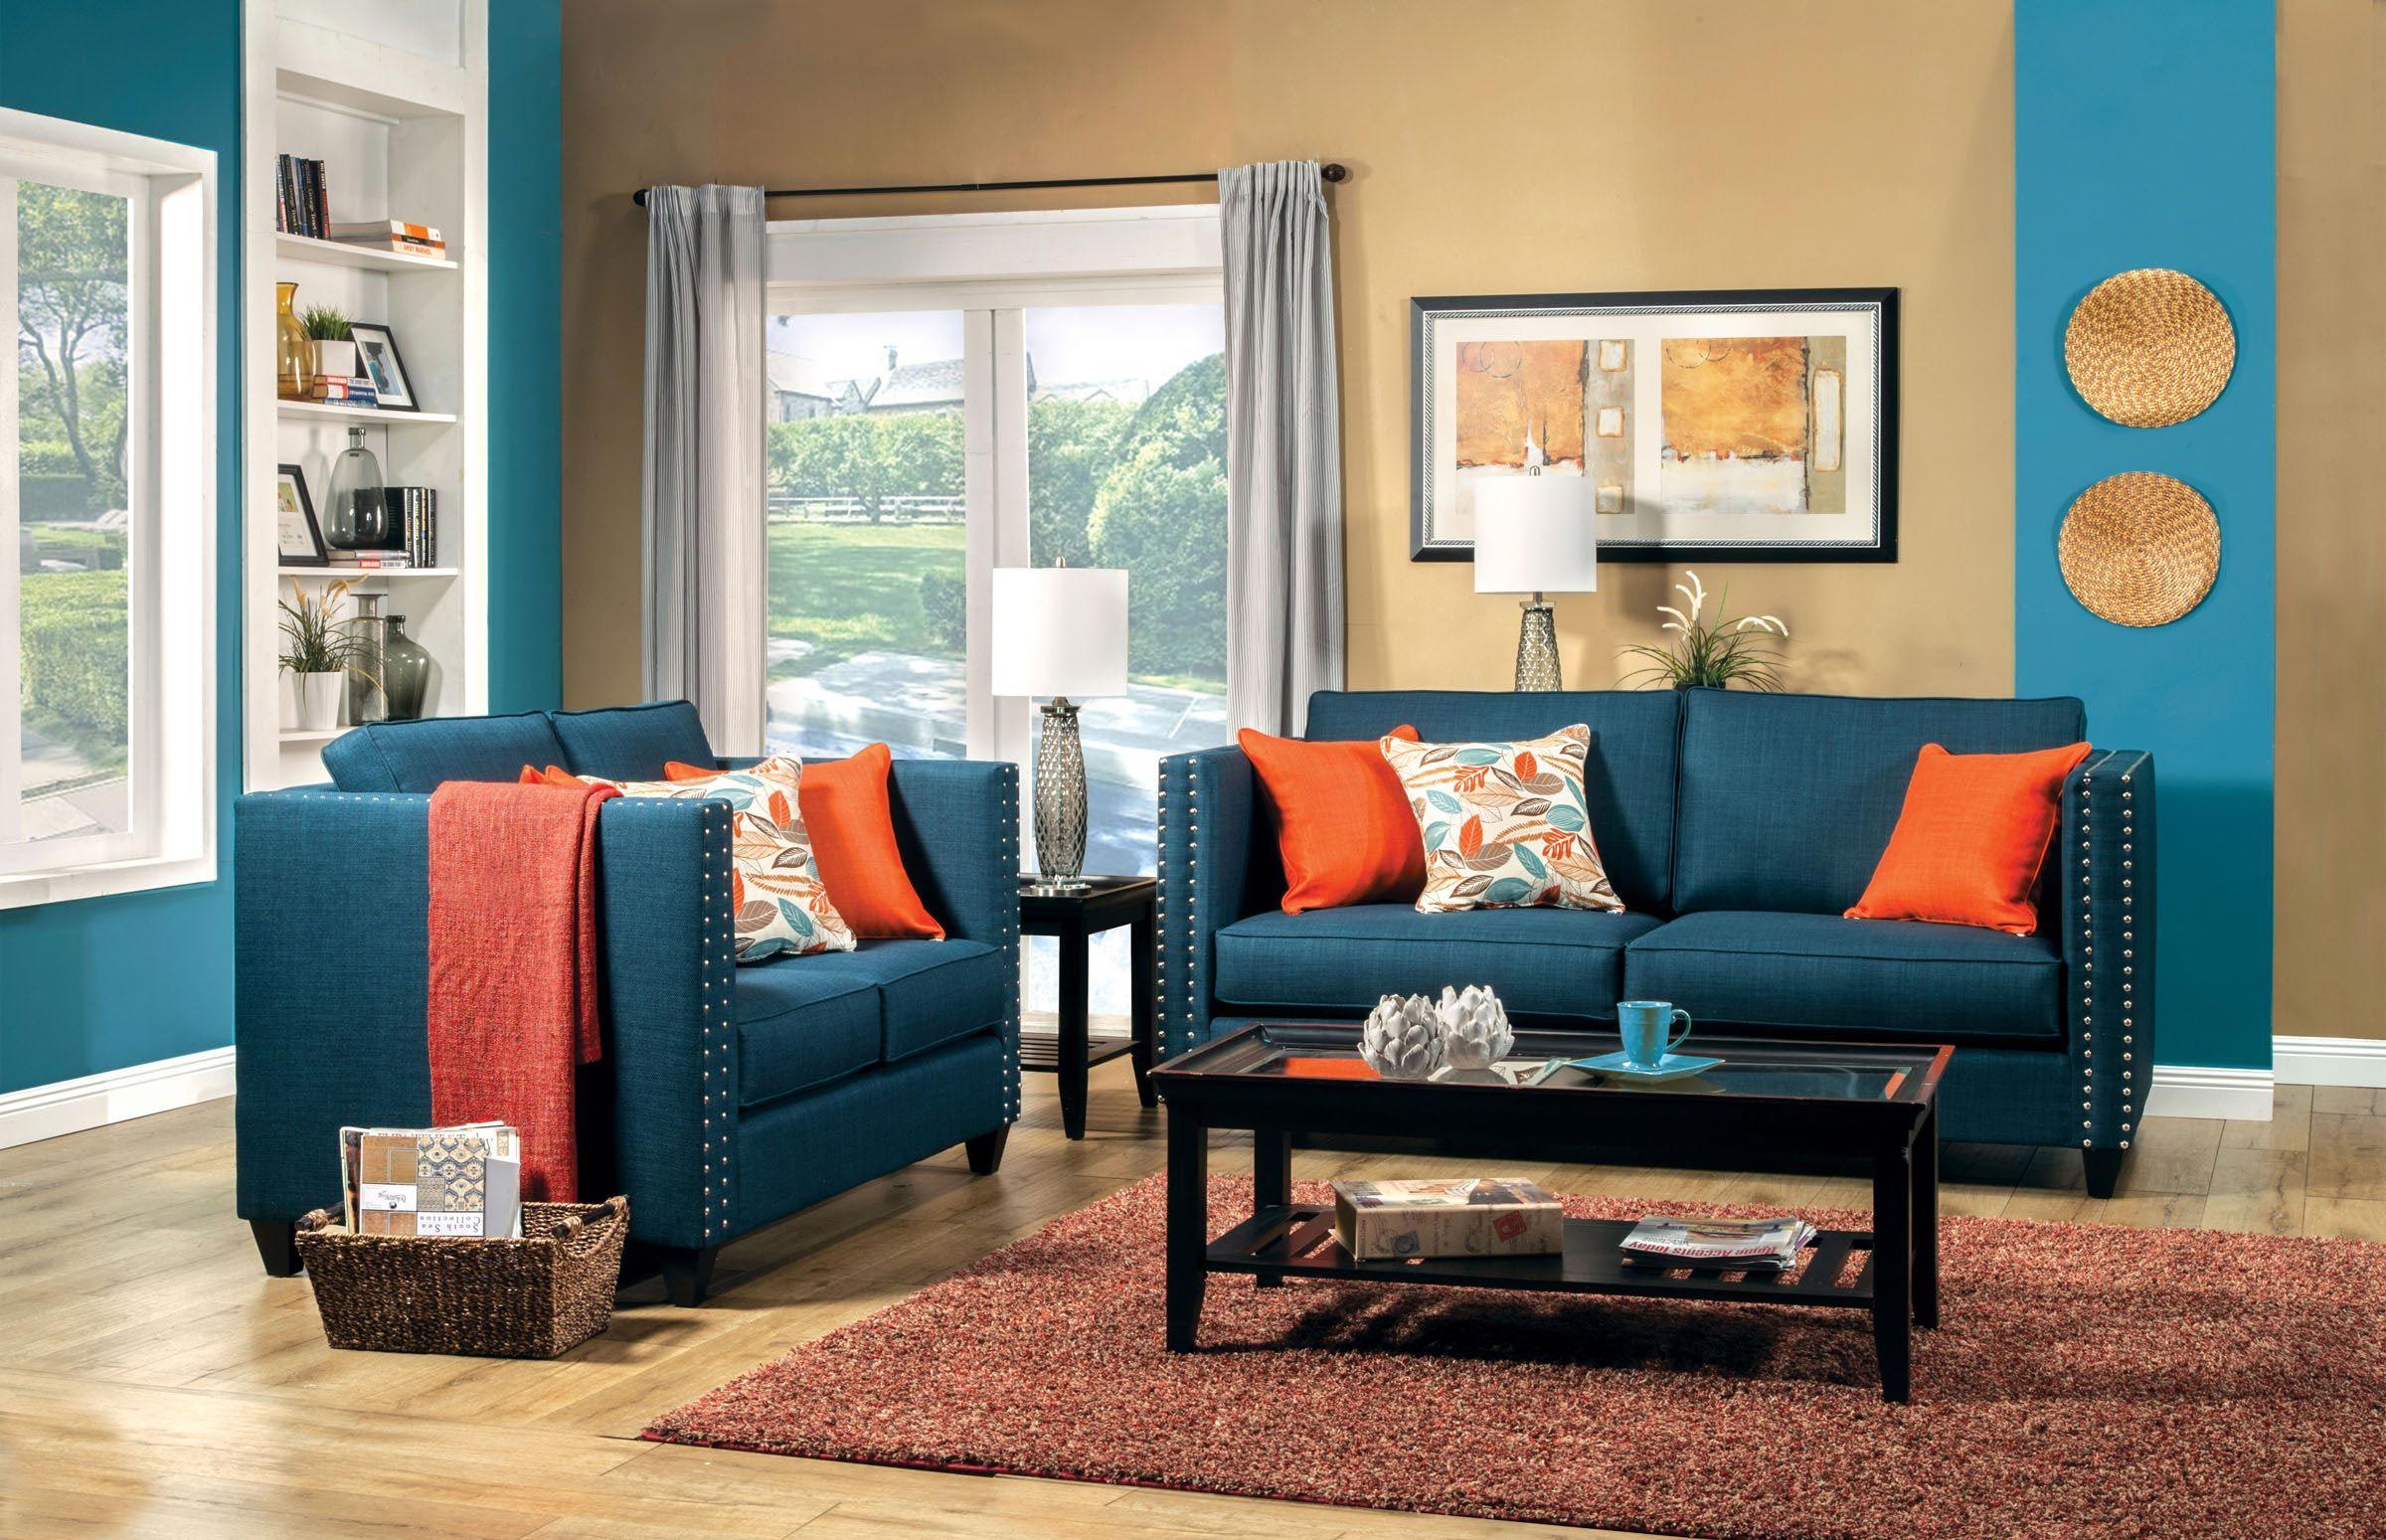 Home Living Room 2 Pcs Turquoise Blue Sofa Set